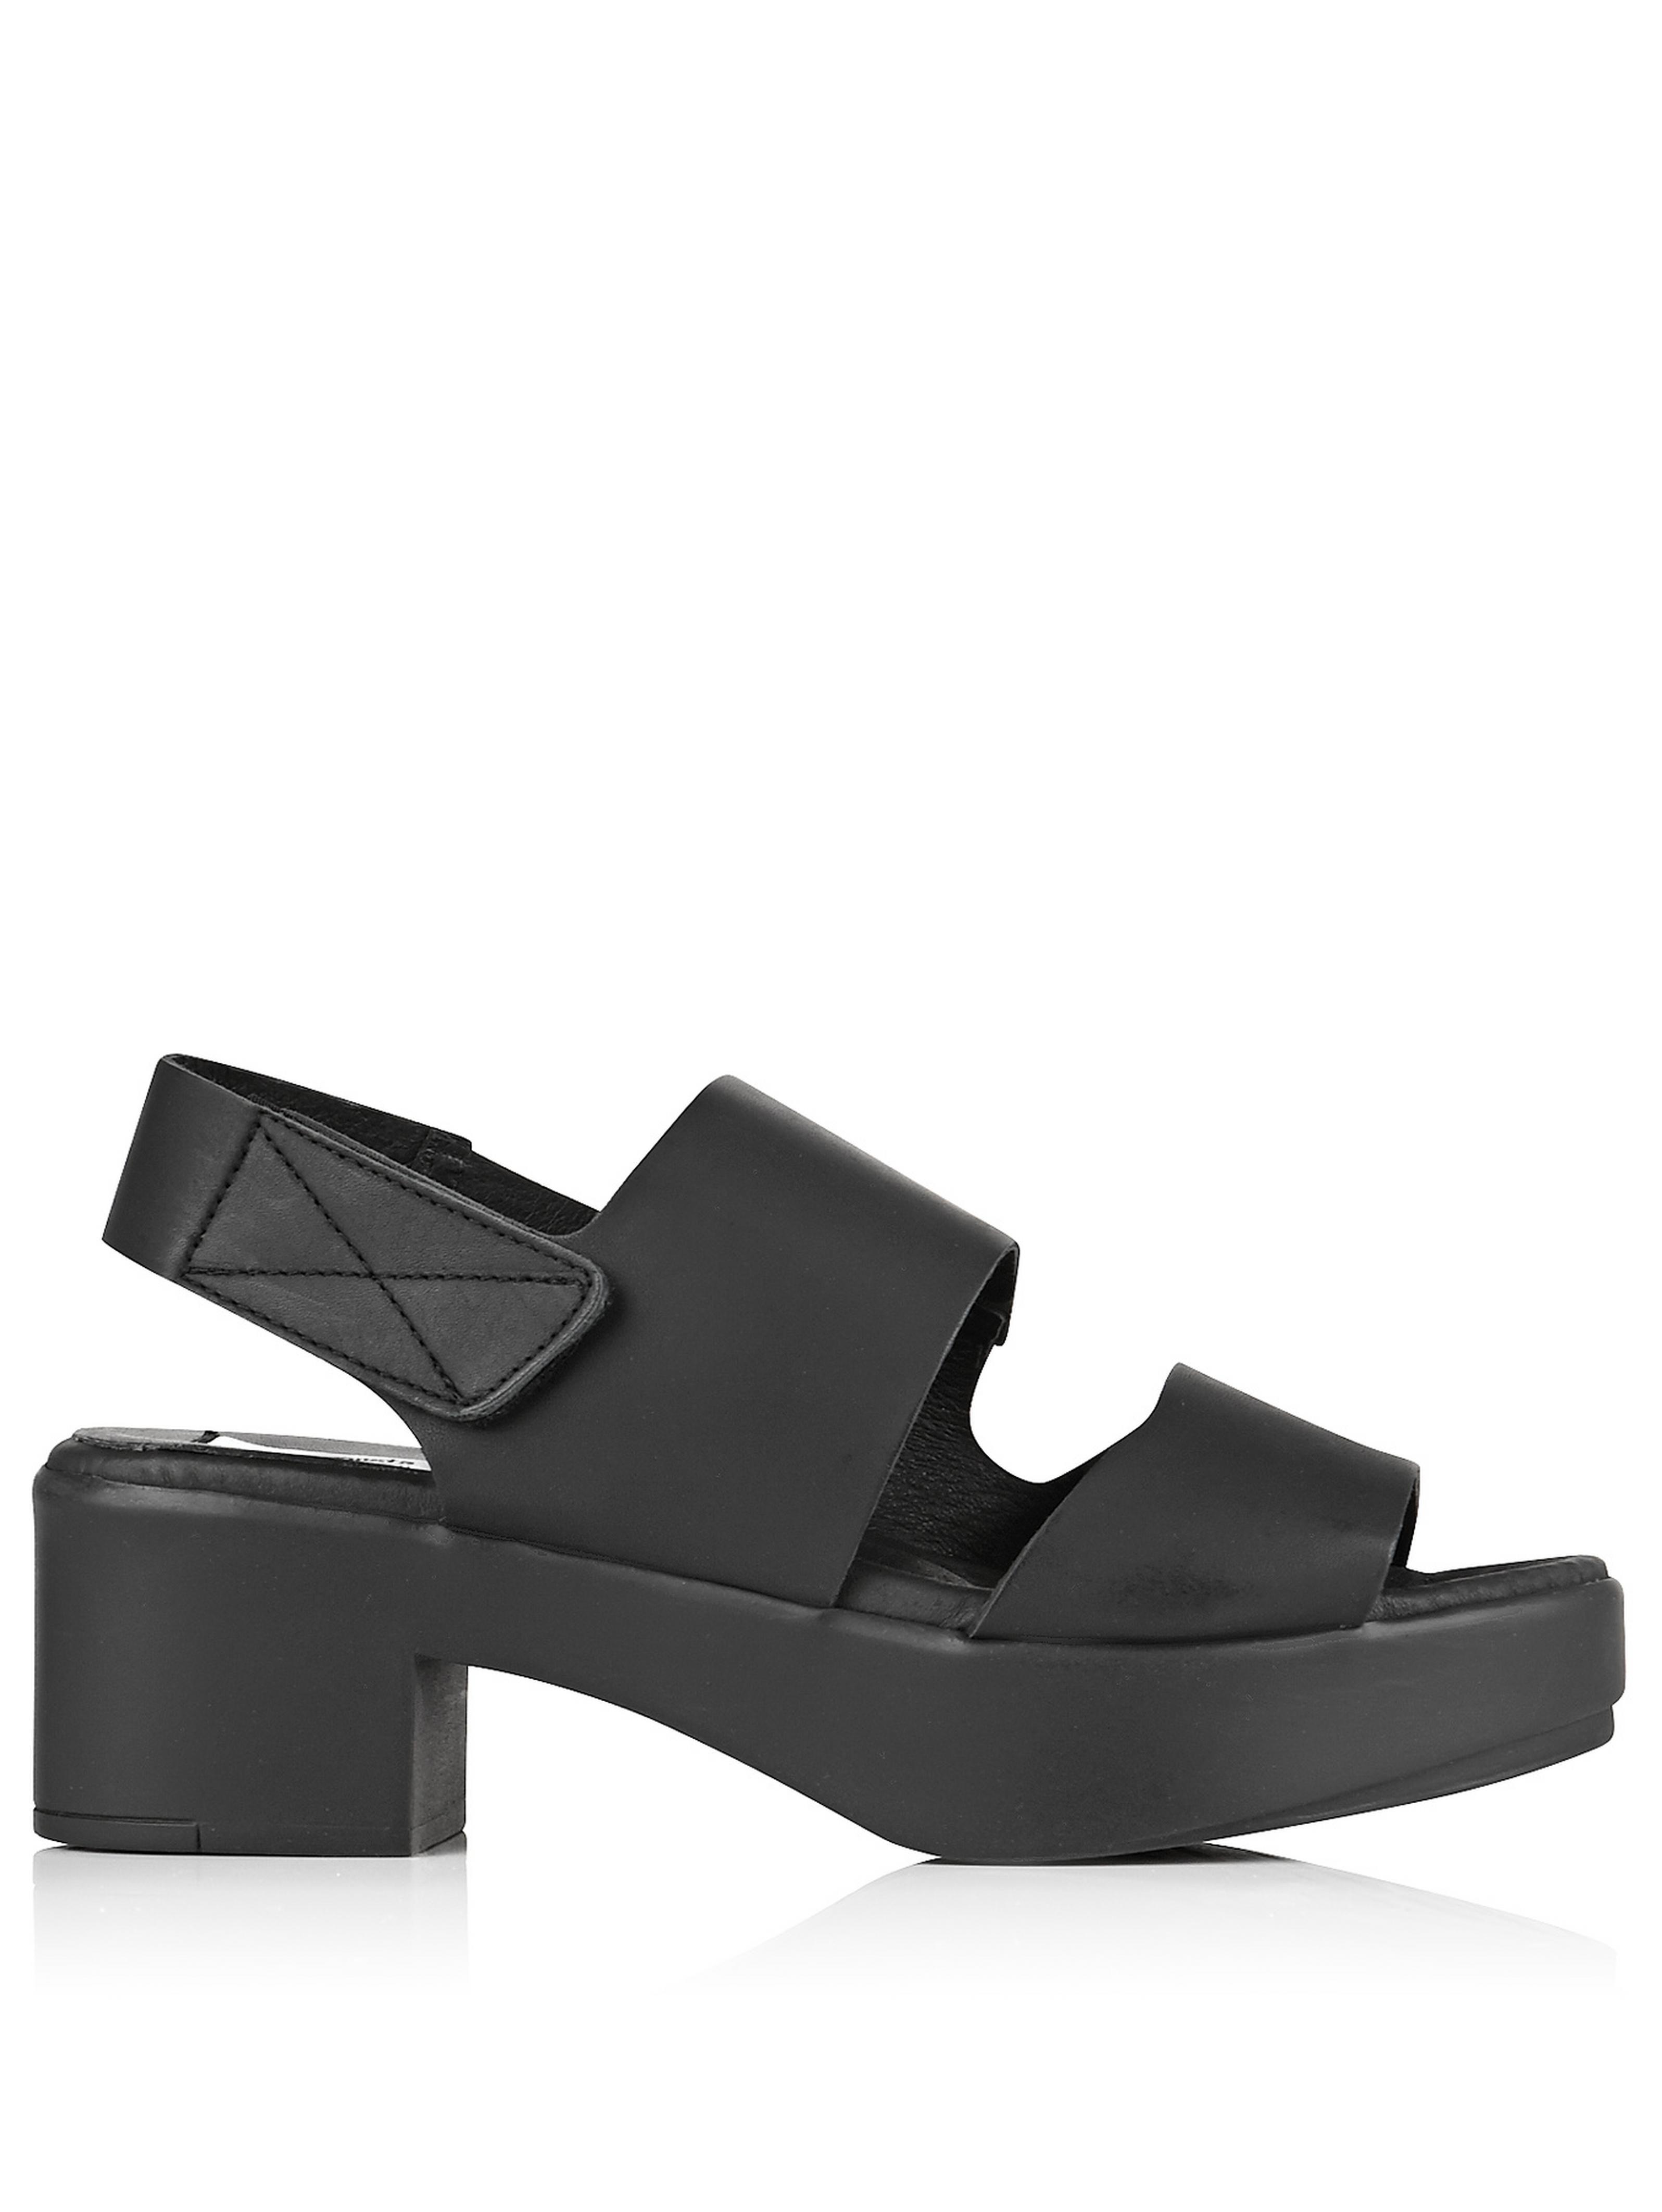 Miista Slingback Grain Leather Sandals cheap sale store under 50 dollars 29mQxXr44d